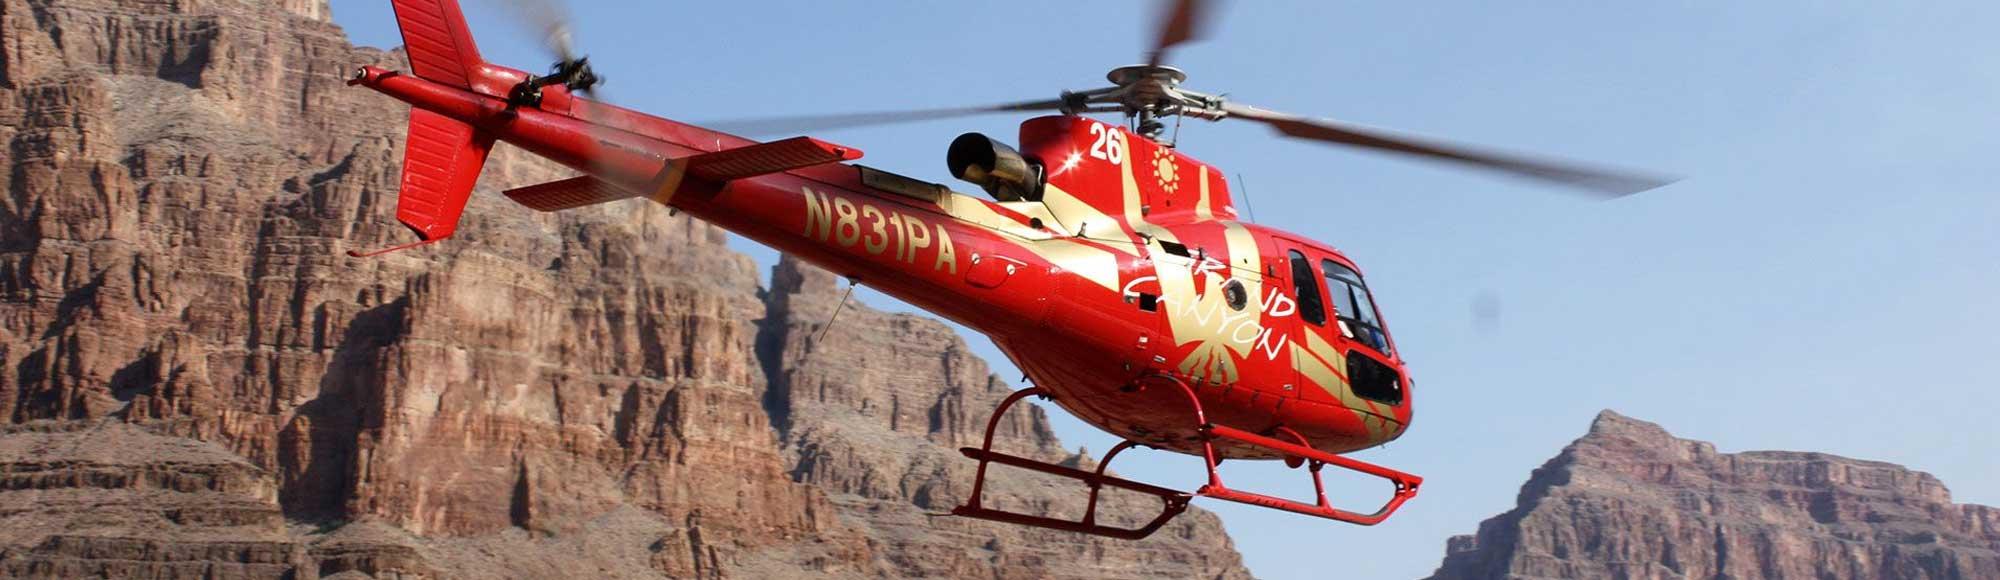 Grand Canyon Voyager tour